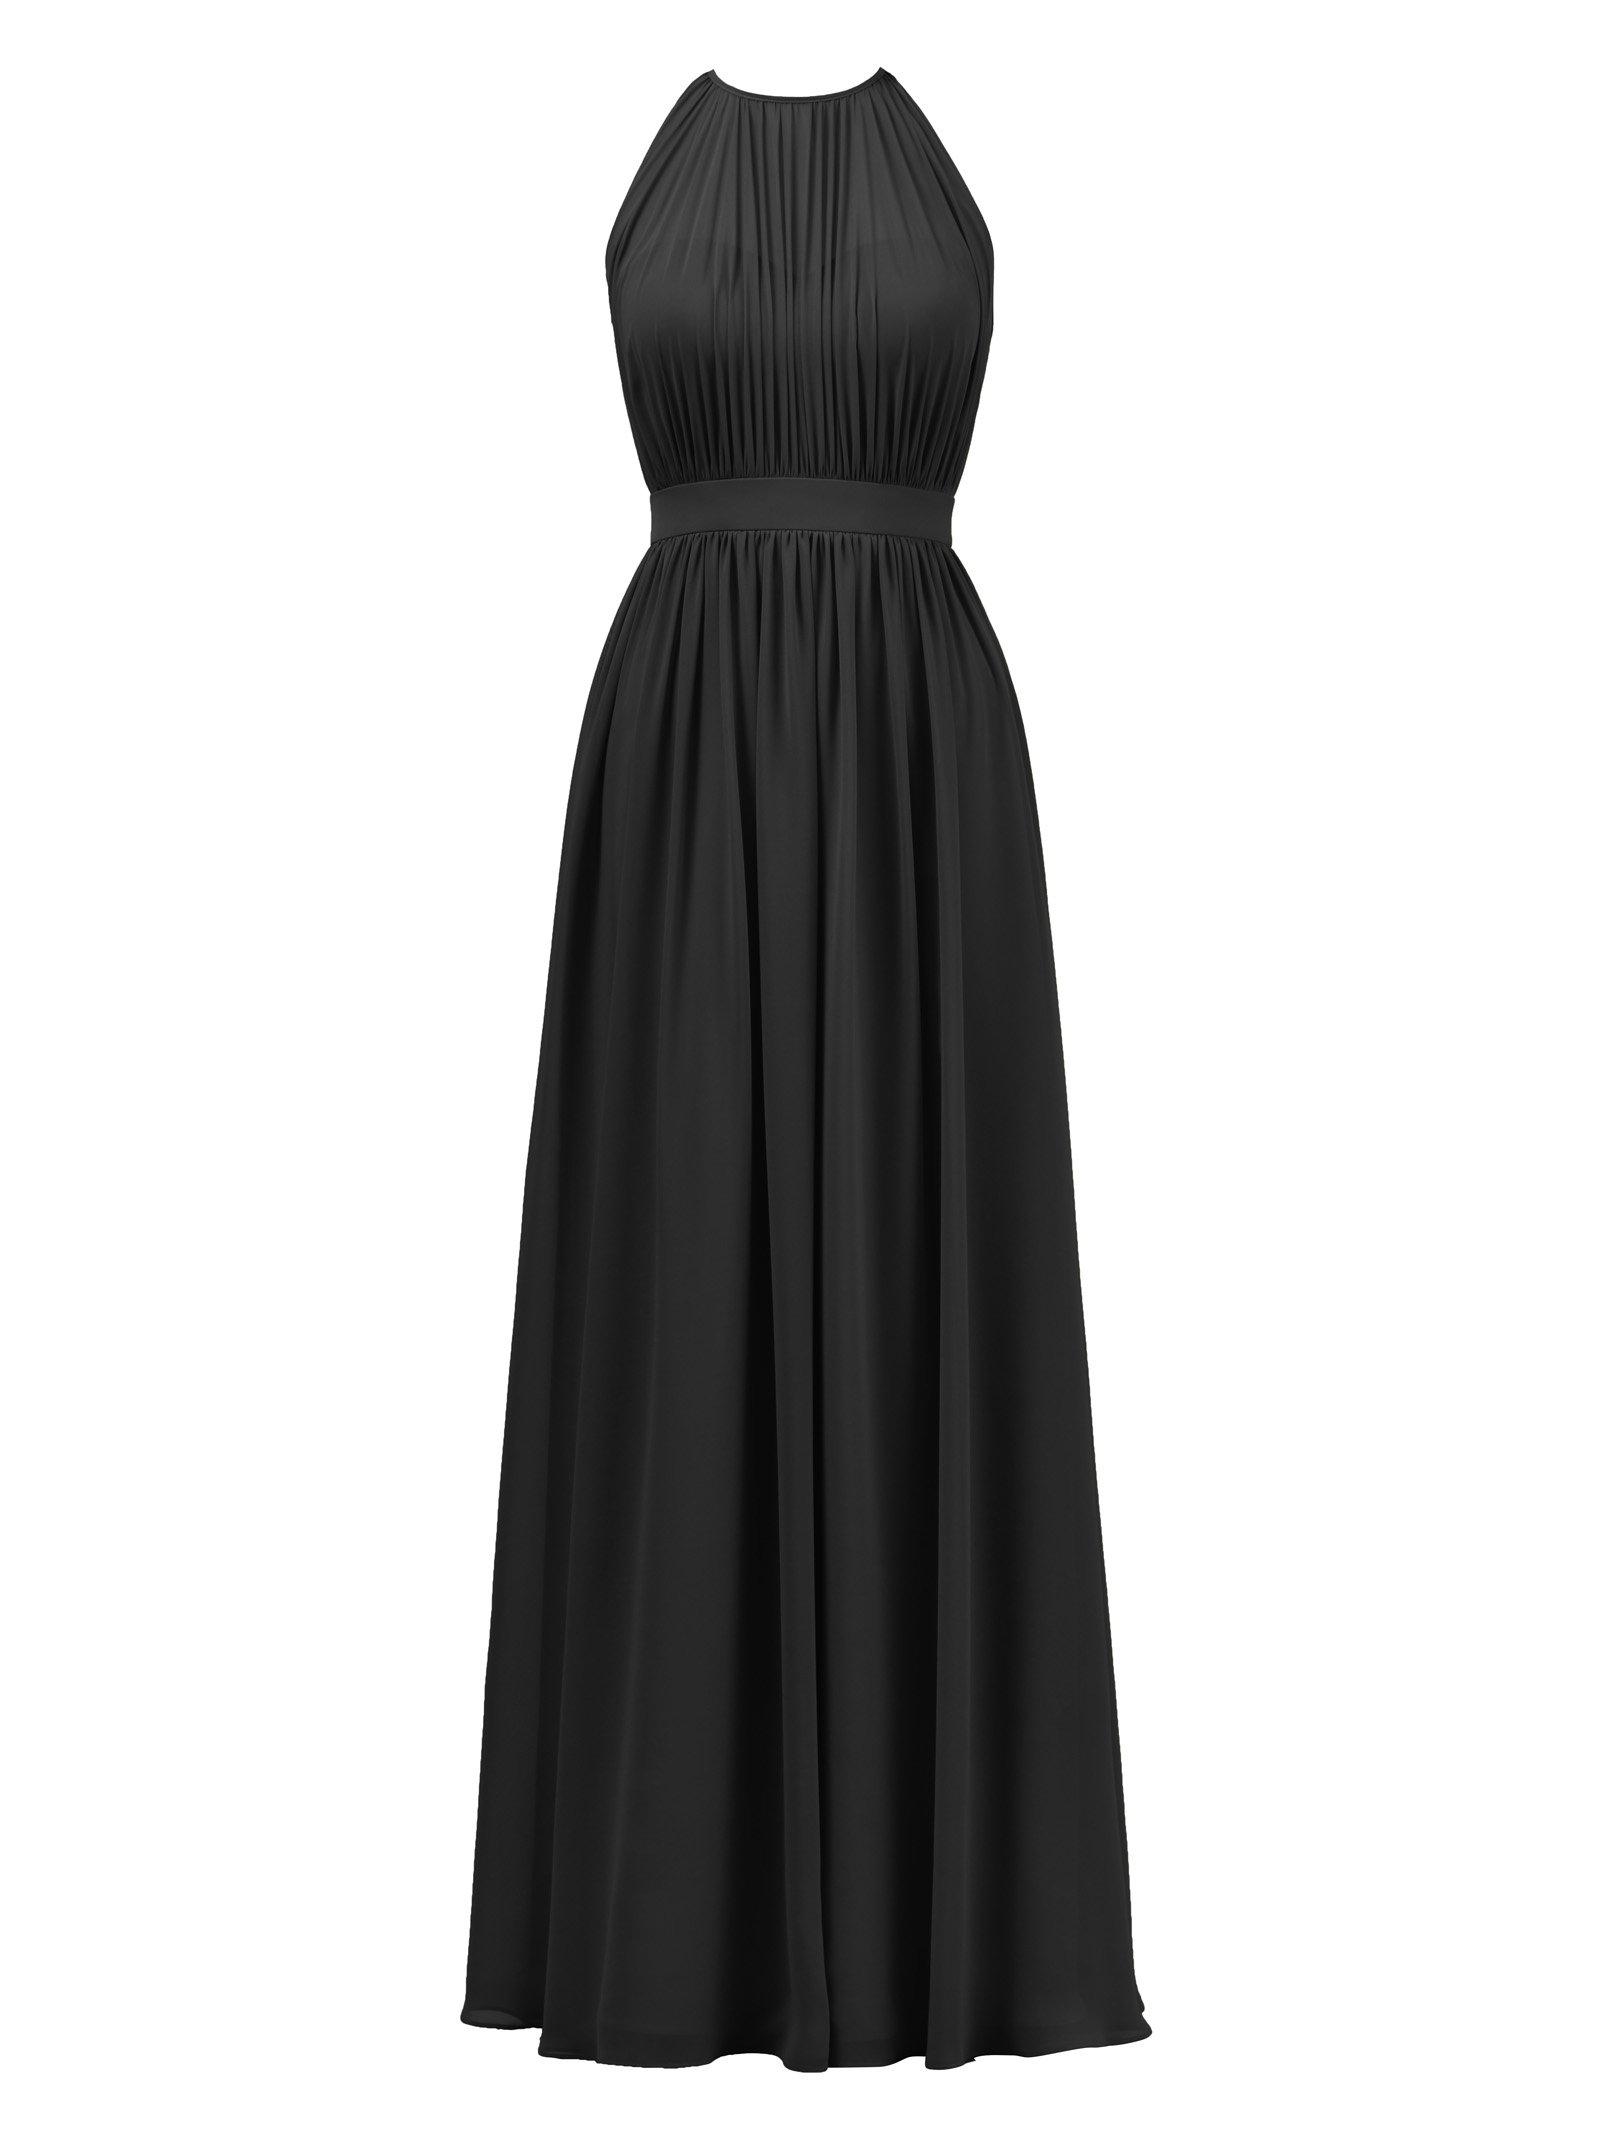 Alicepub Halter Illusion Bridesmaid Dress Chiffon Formal Evening Prom Gown Maxi